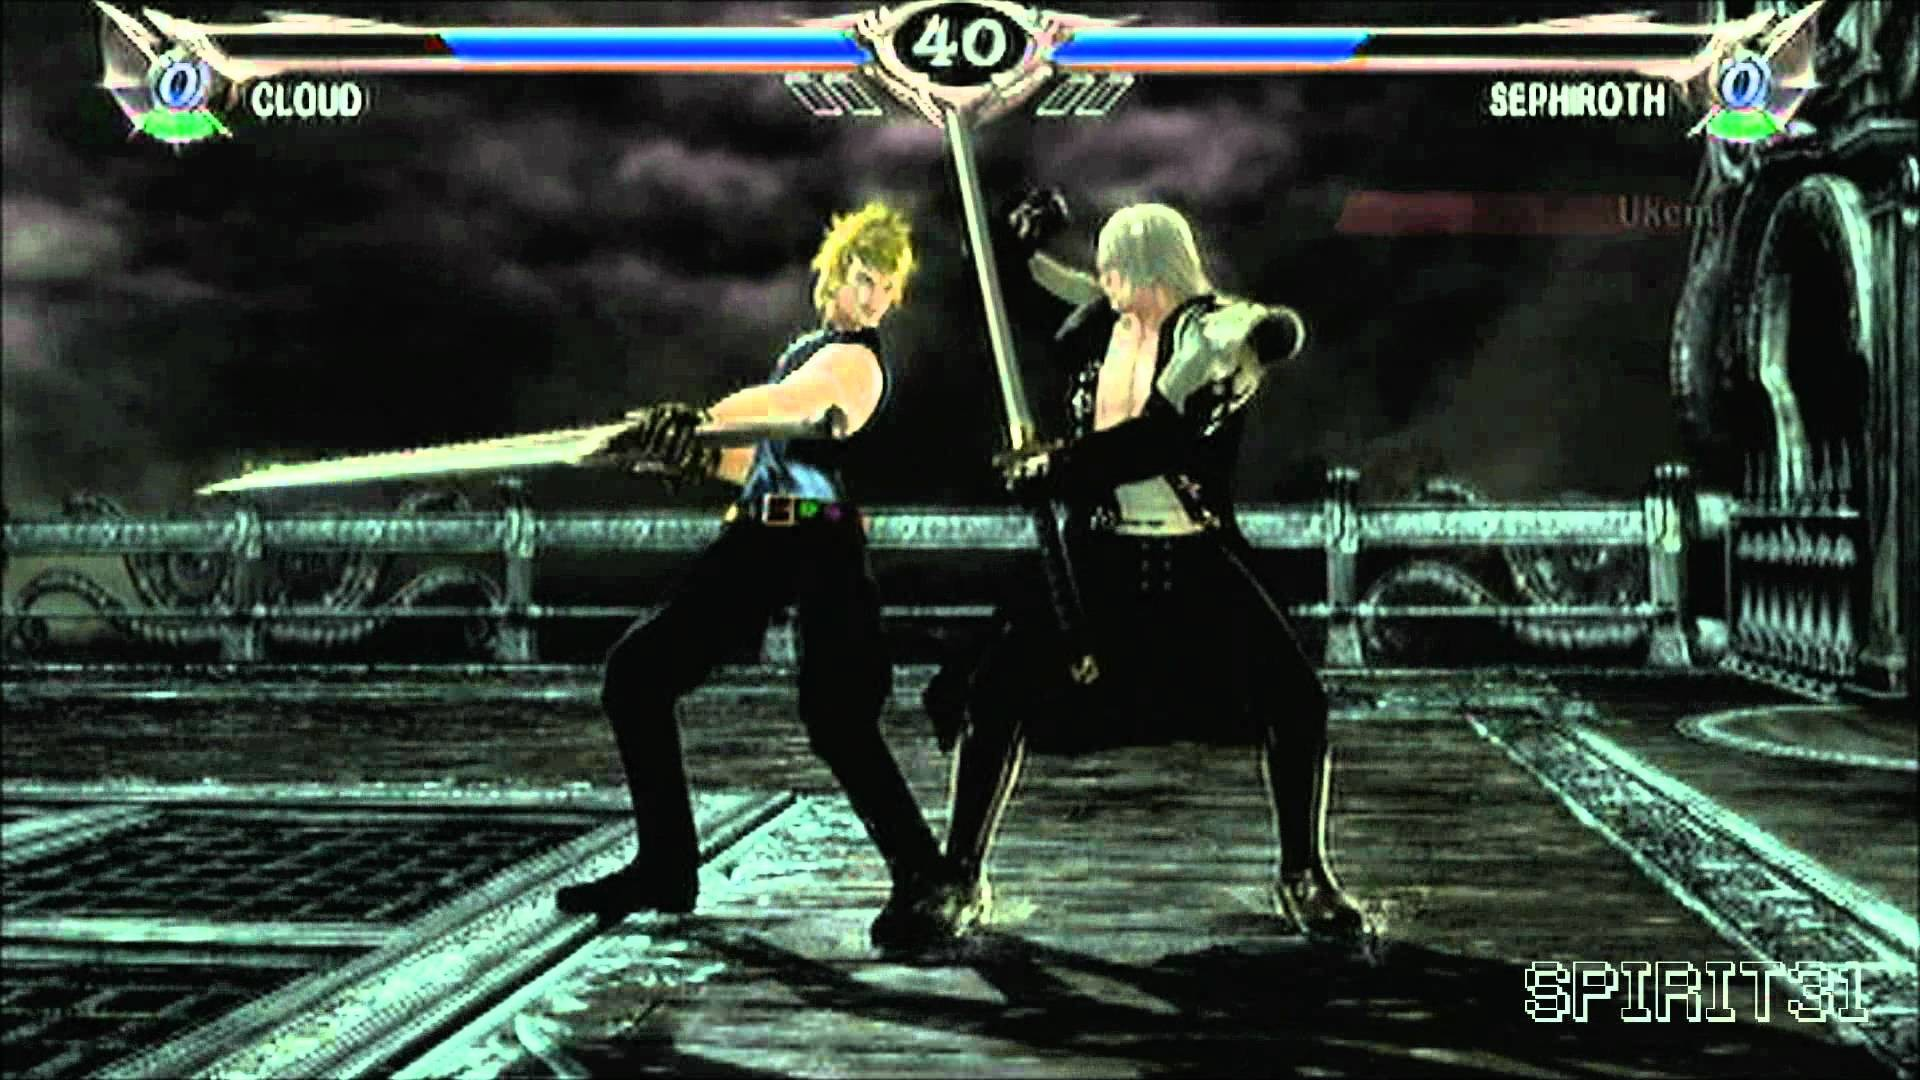 Soul Calibur V – Cloud vs Sephiroth [HD]